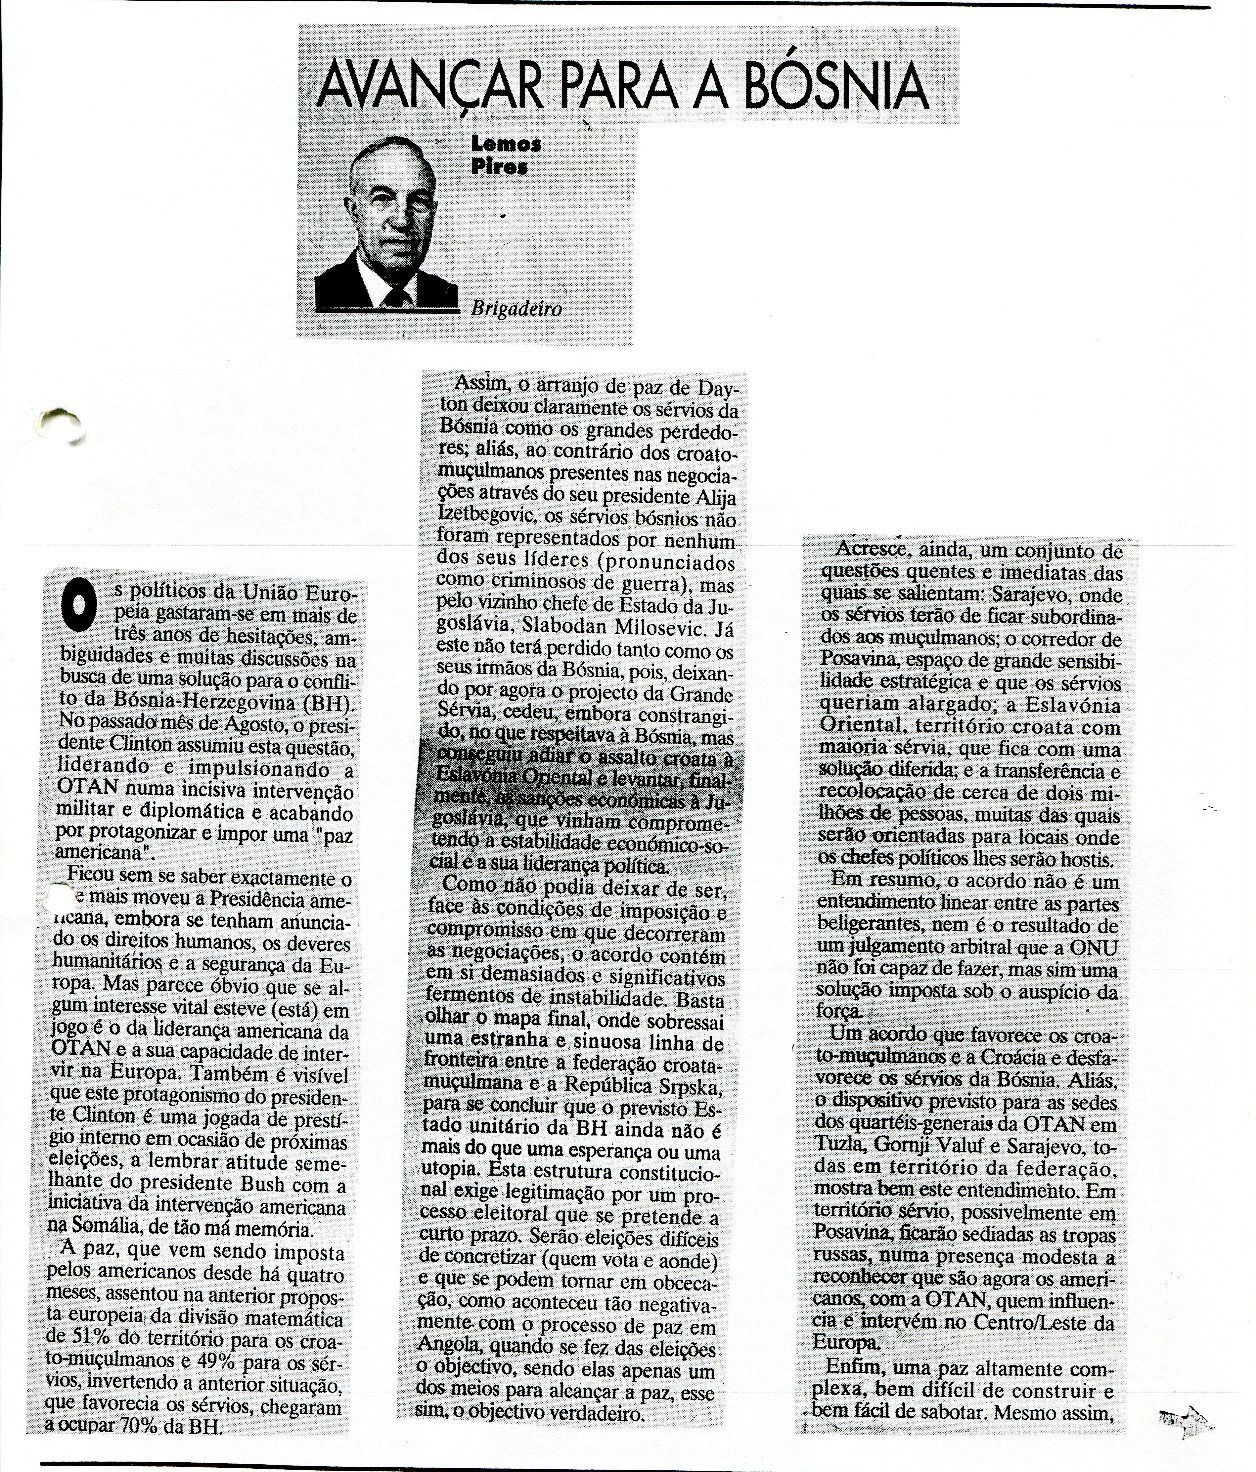 18DEZ95 - Jornal de Noticias